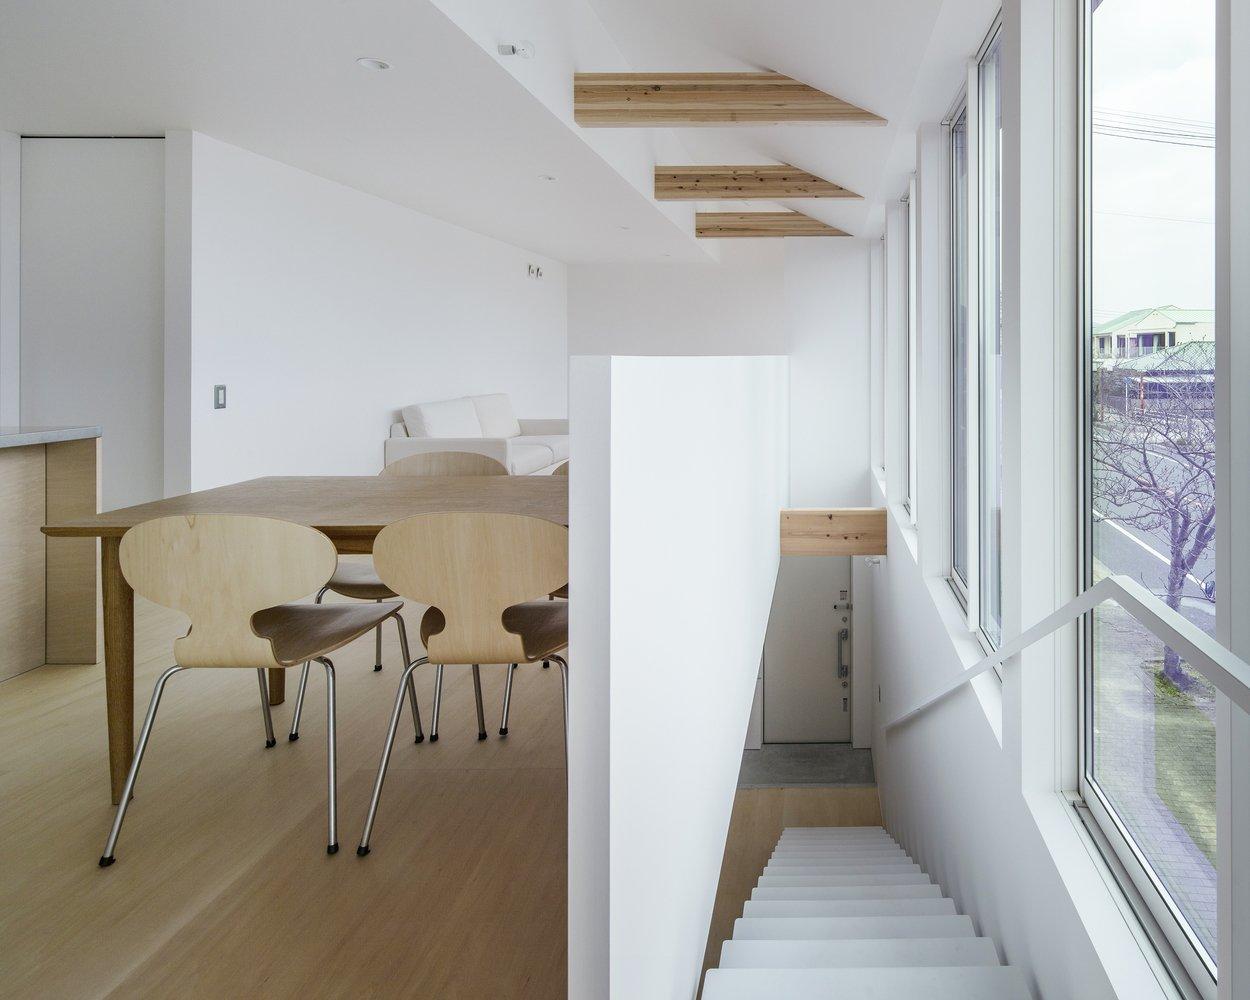 Photo 2 of 7 in House in Futako by Yabashi Architects & Associates